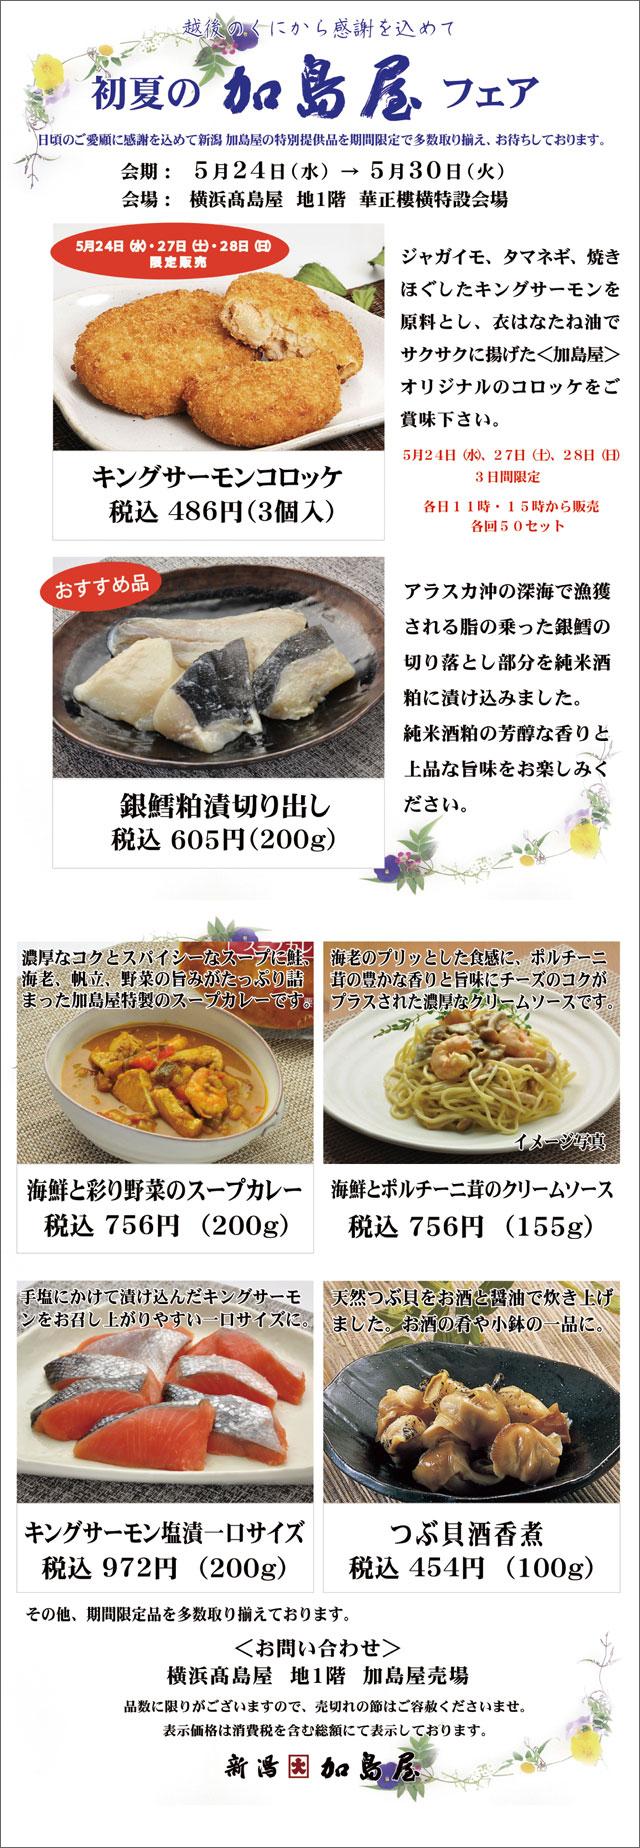 髙島屋横浜店「初夏の加島屋フェア」